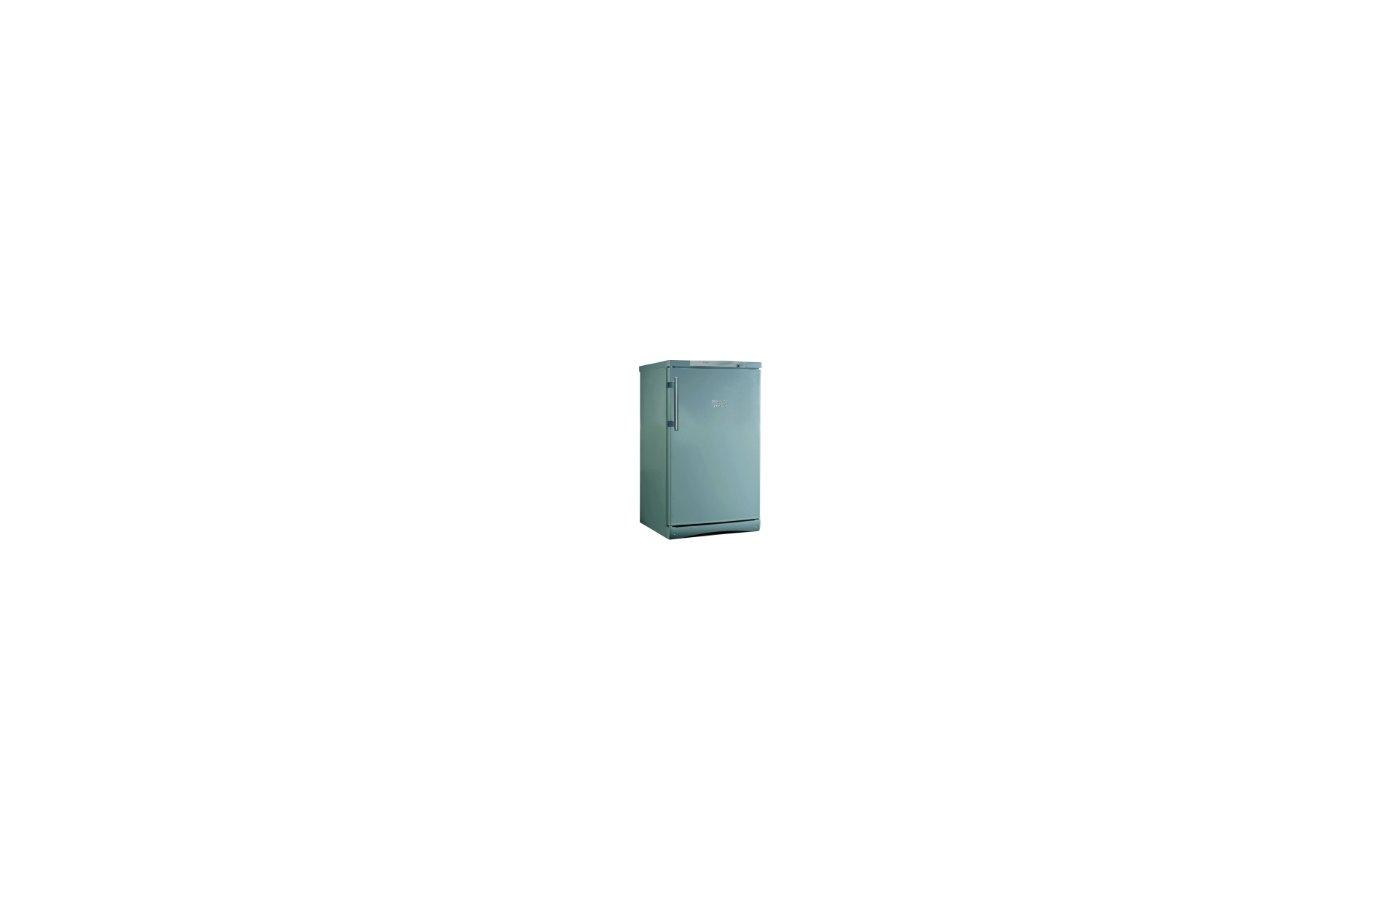 Морозильная камера вертикальная HOTPOINT-ARISTON RMUP 100 XH